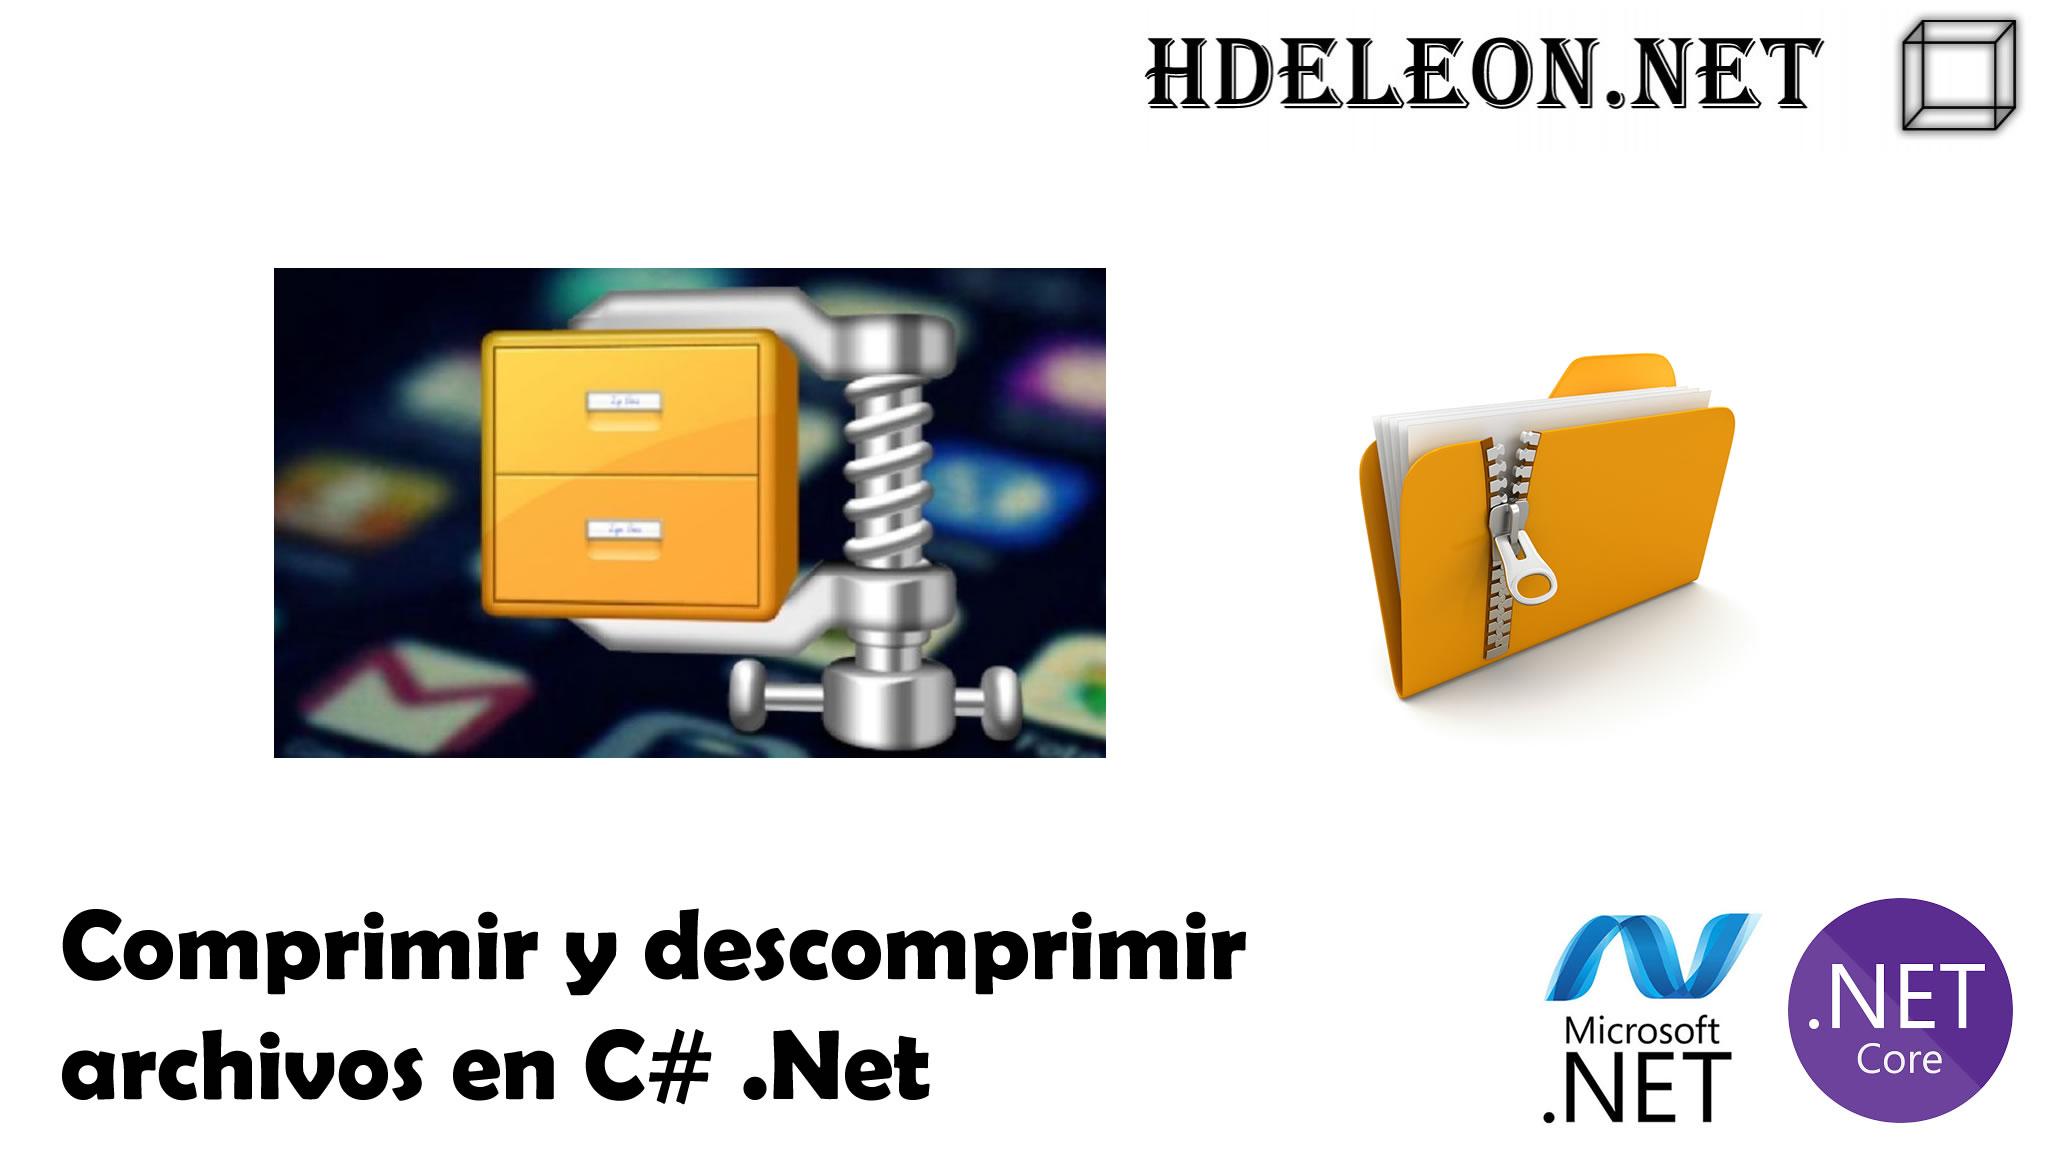 Comprimir y descomprimir archivos en C# .Net